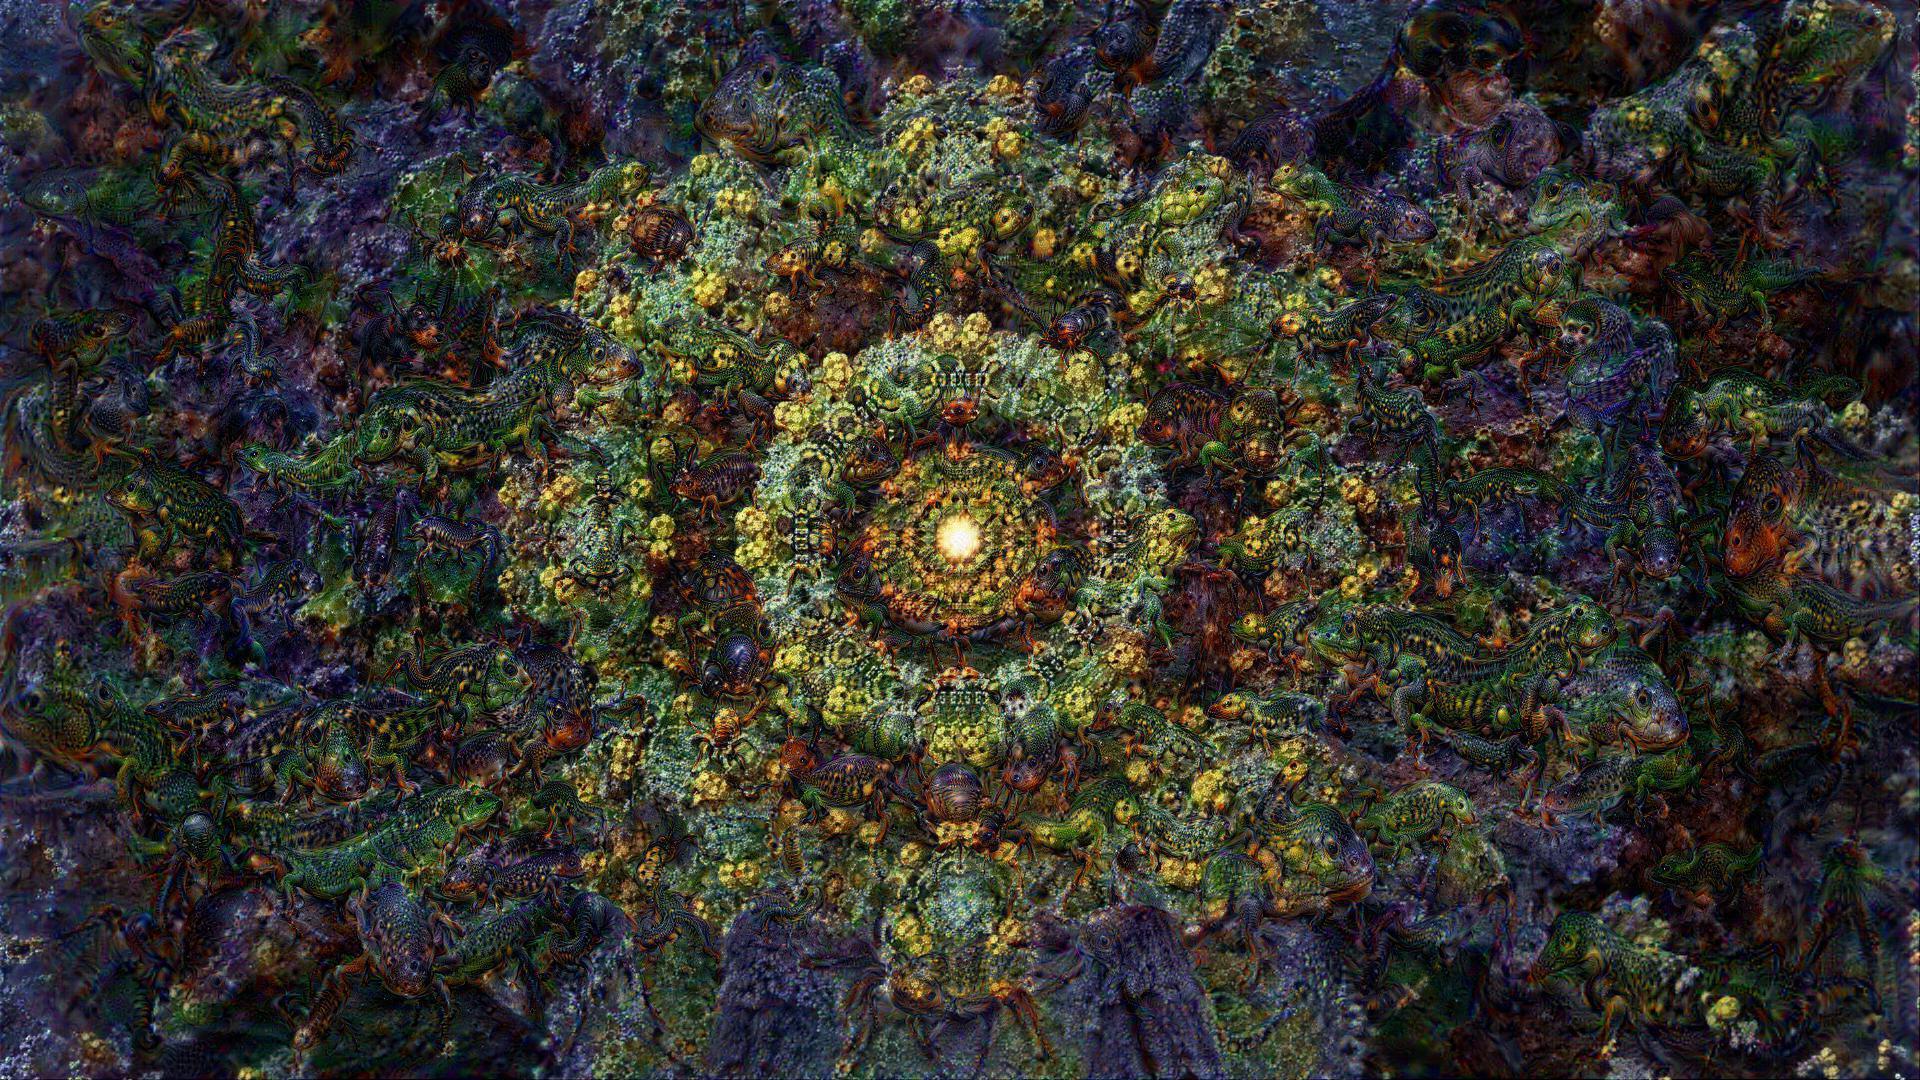 ACID EYE 360 VR - Psychedelic Deep Dream Fractal 3 by schizo604